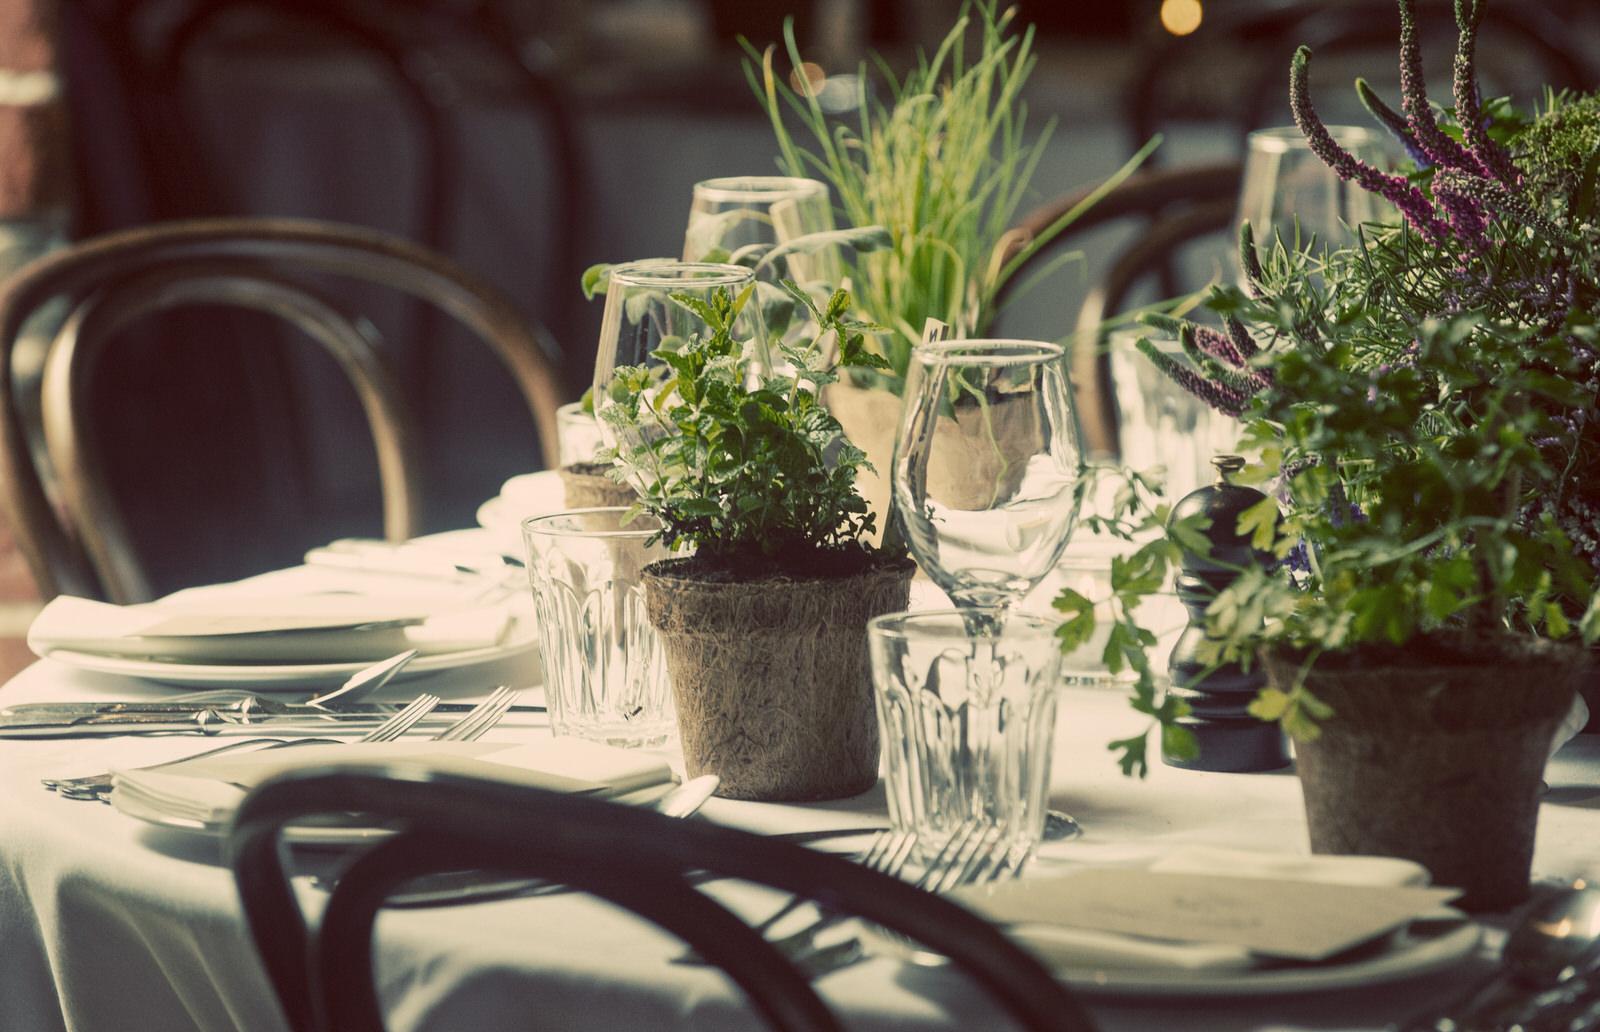 _MG_6073-2 David Wadley shustoke+barn+warwickshire+wedding+venue  (25)shustoke+barn+warwickshire+wedding+venue.jpg